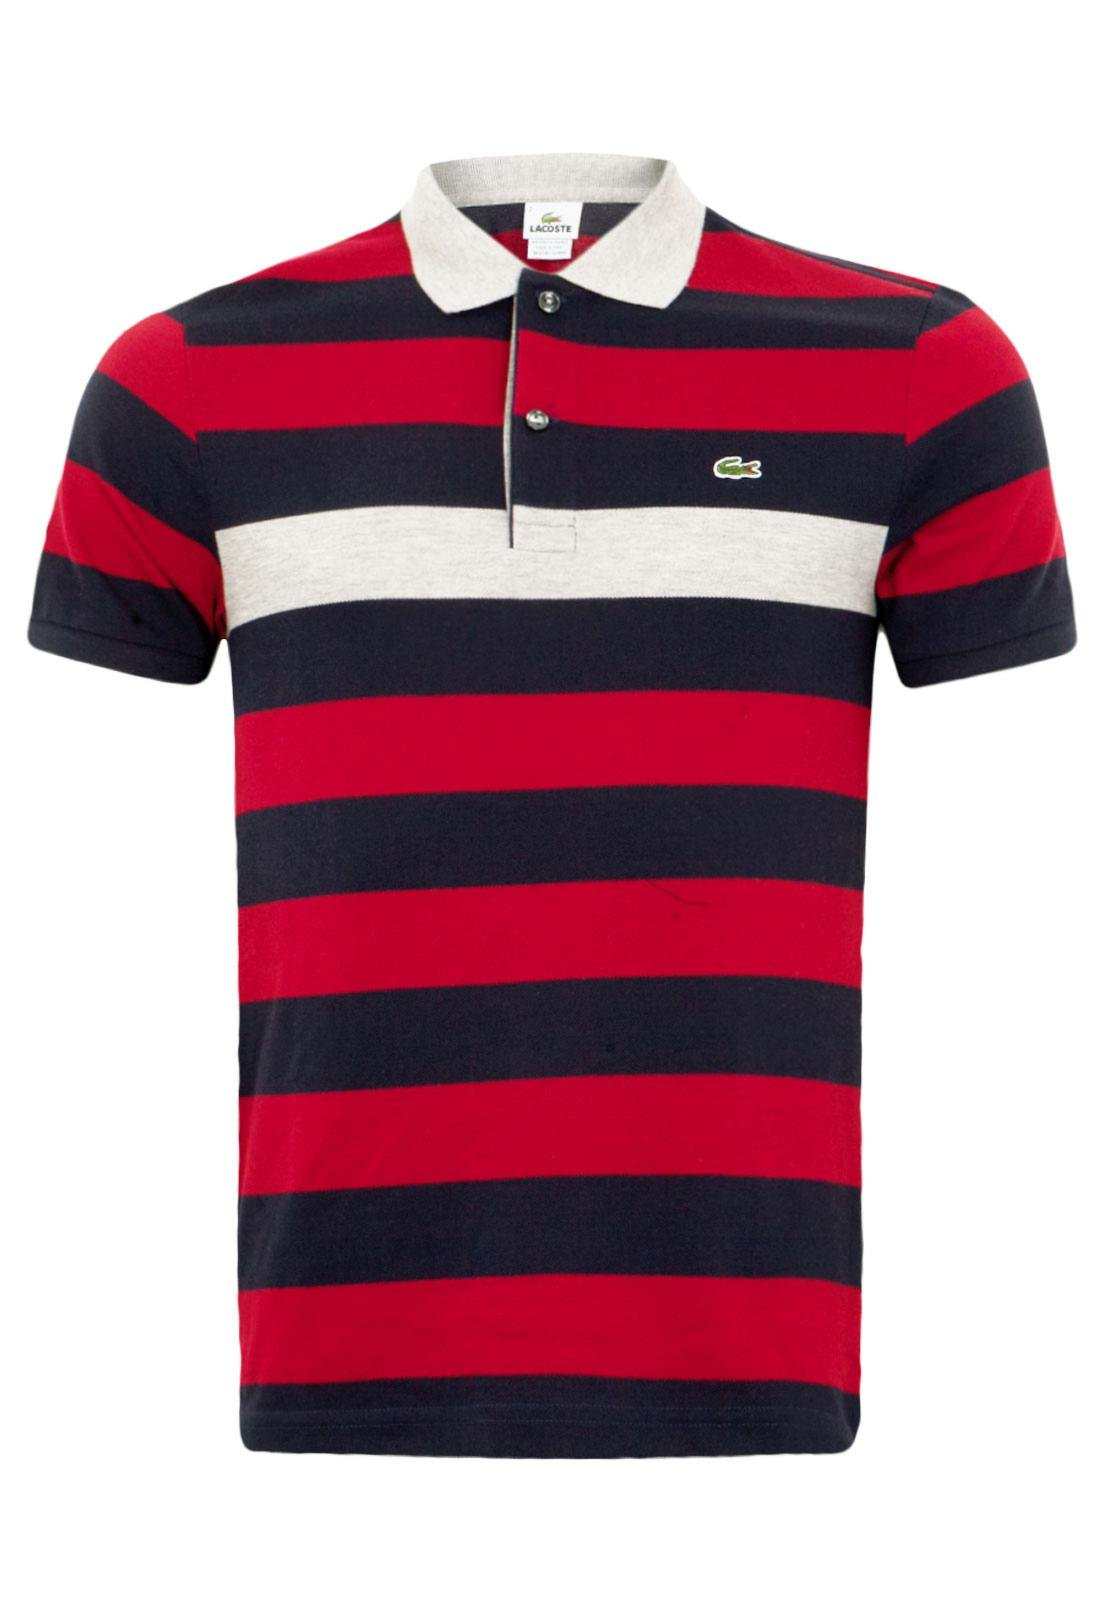 Camisa Da Lacoste Em Promocao